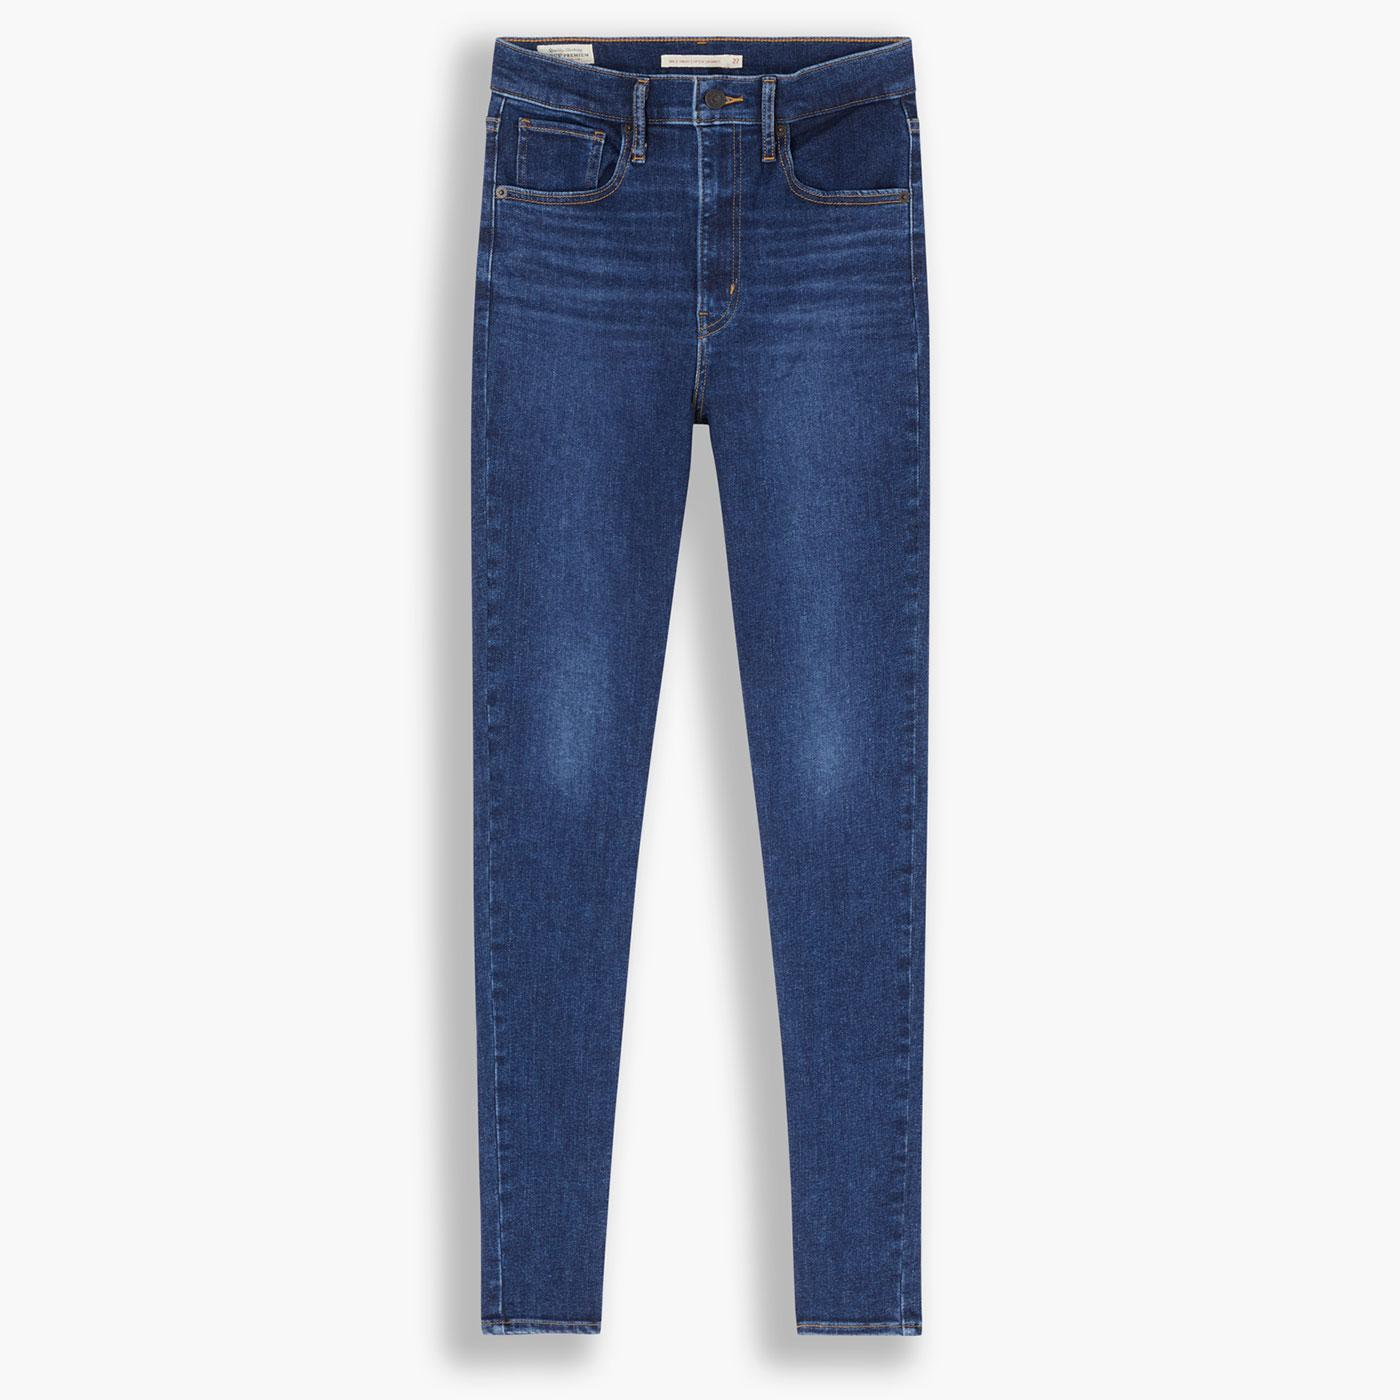 LEVI'S Mile High Women's Super Skinny Jeans (RIC)